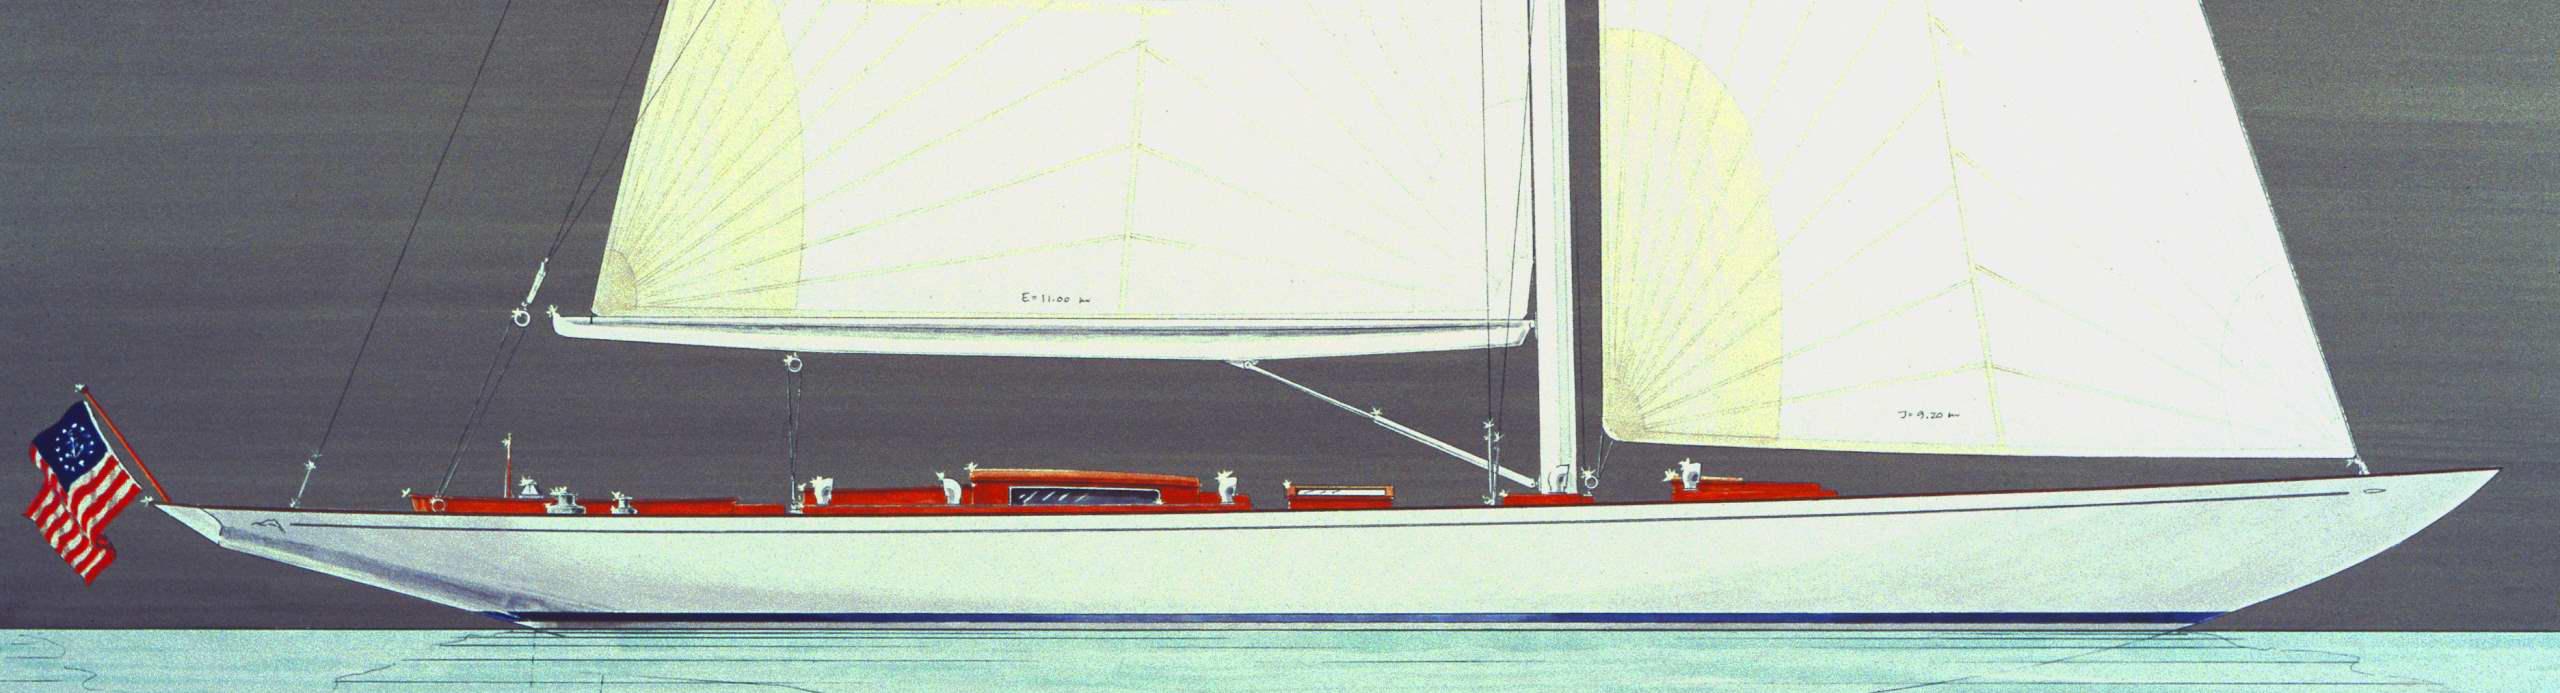 90' Classic, (c) Heyman Yachts